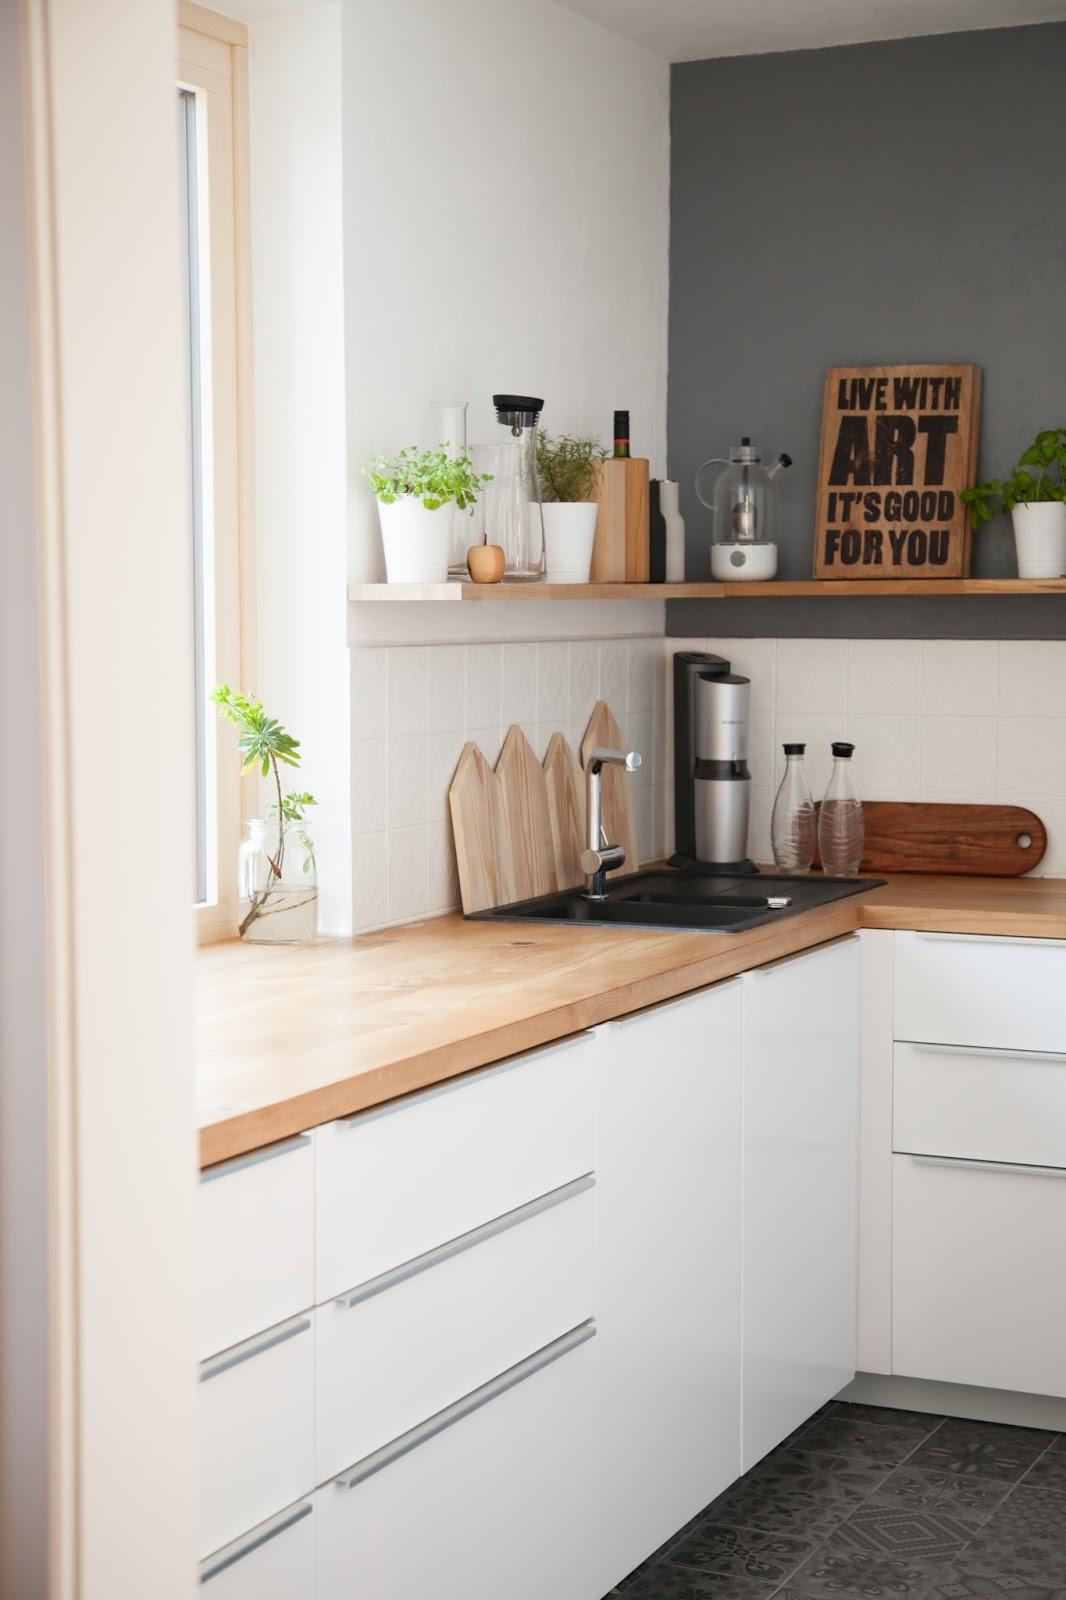 Coole Dekoration Ikea Ideen Kueche - Schlafzimmer Wandfarbe Konzeption